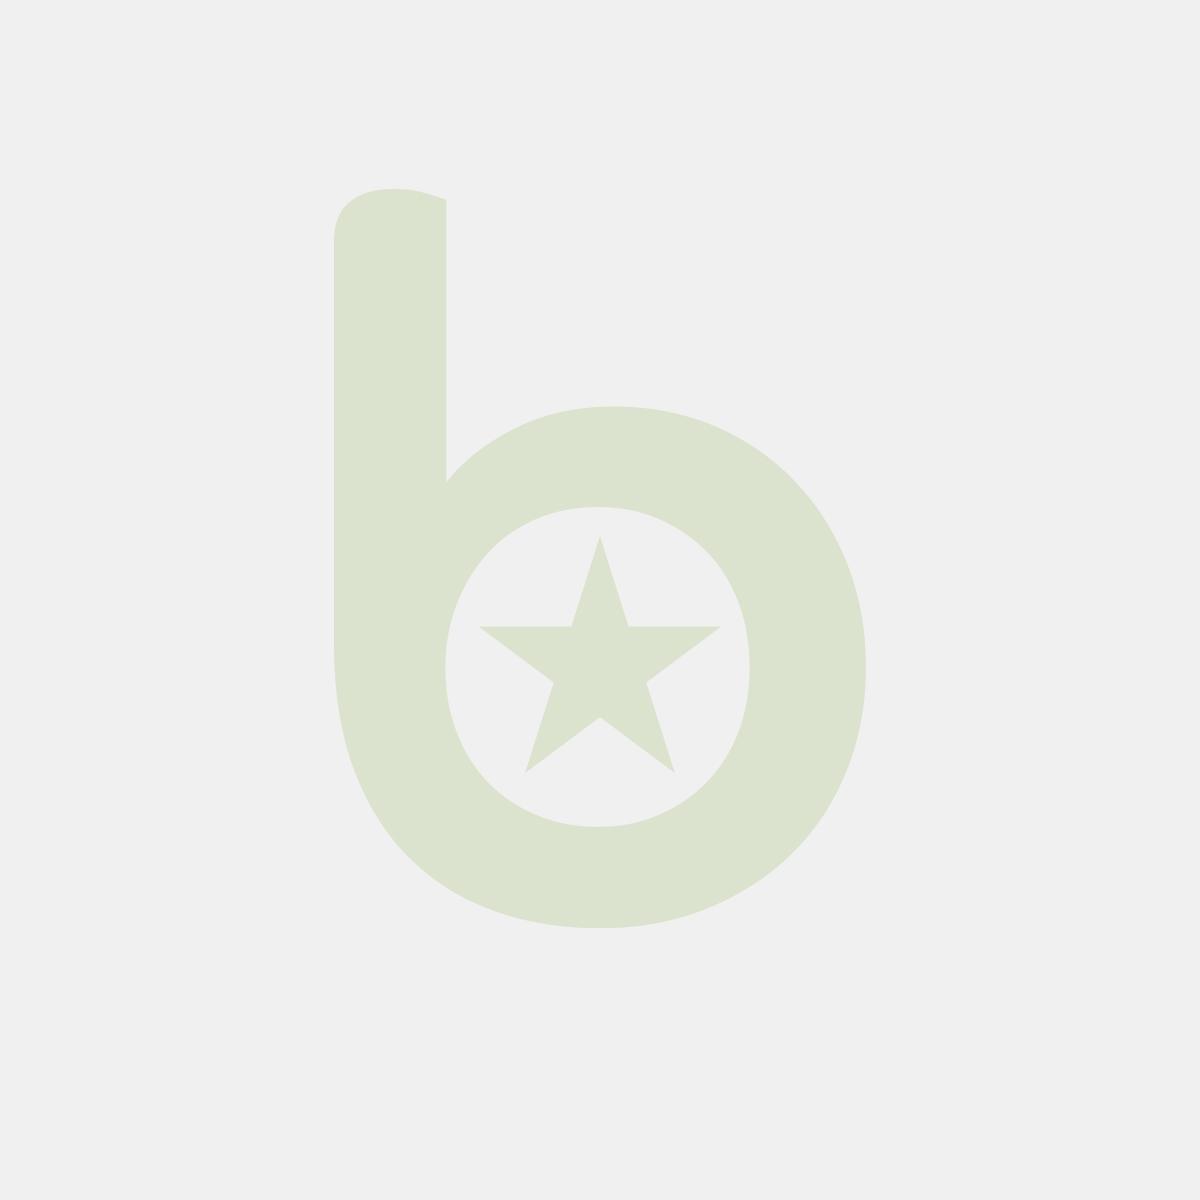 FINGERFOOD - pucharek TULIPAN 70ml transparentny PS op. 25 sztuk